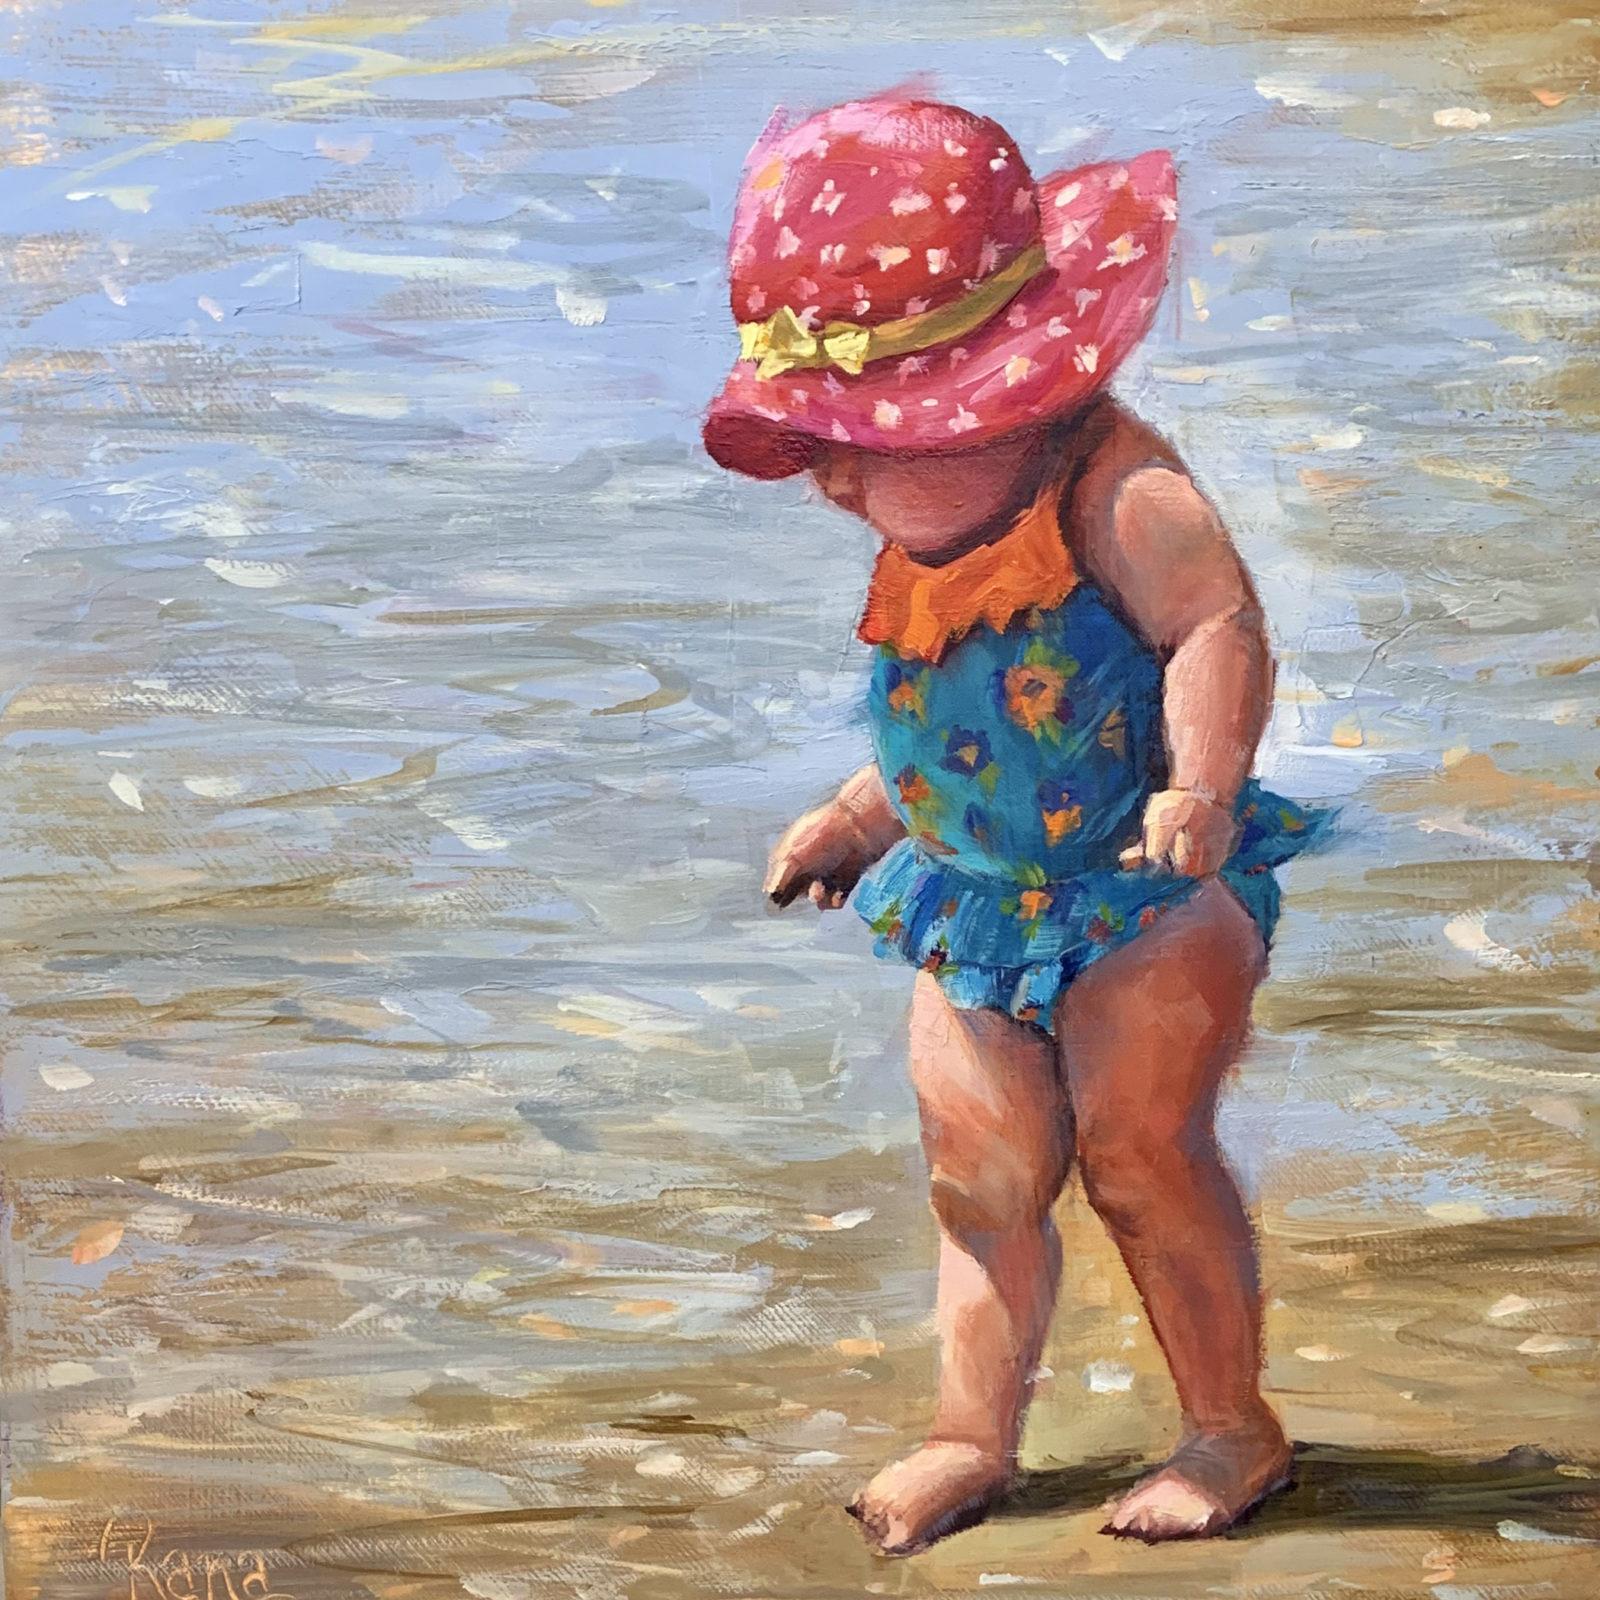 Rana Jordahl, Beach Baby